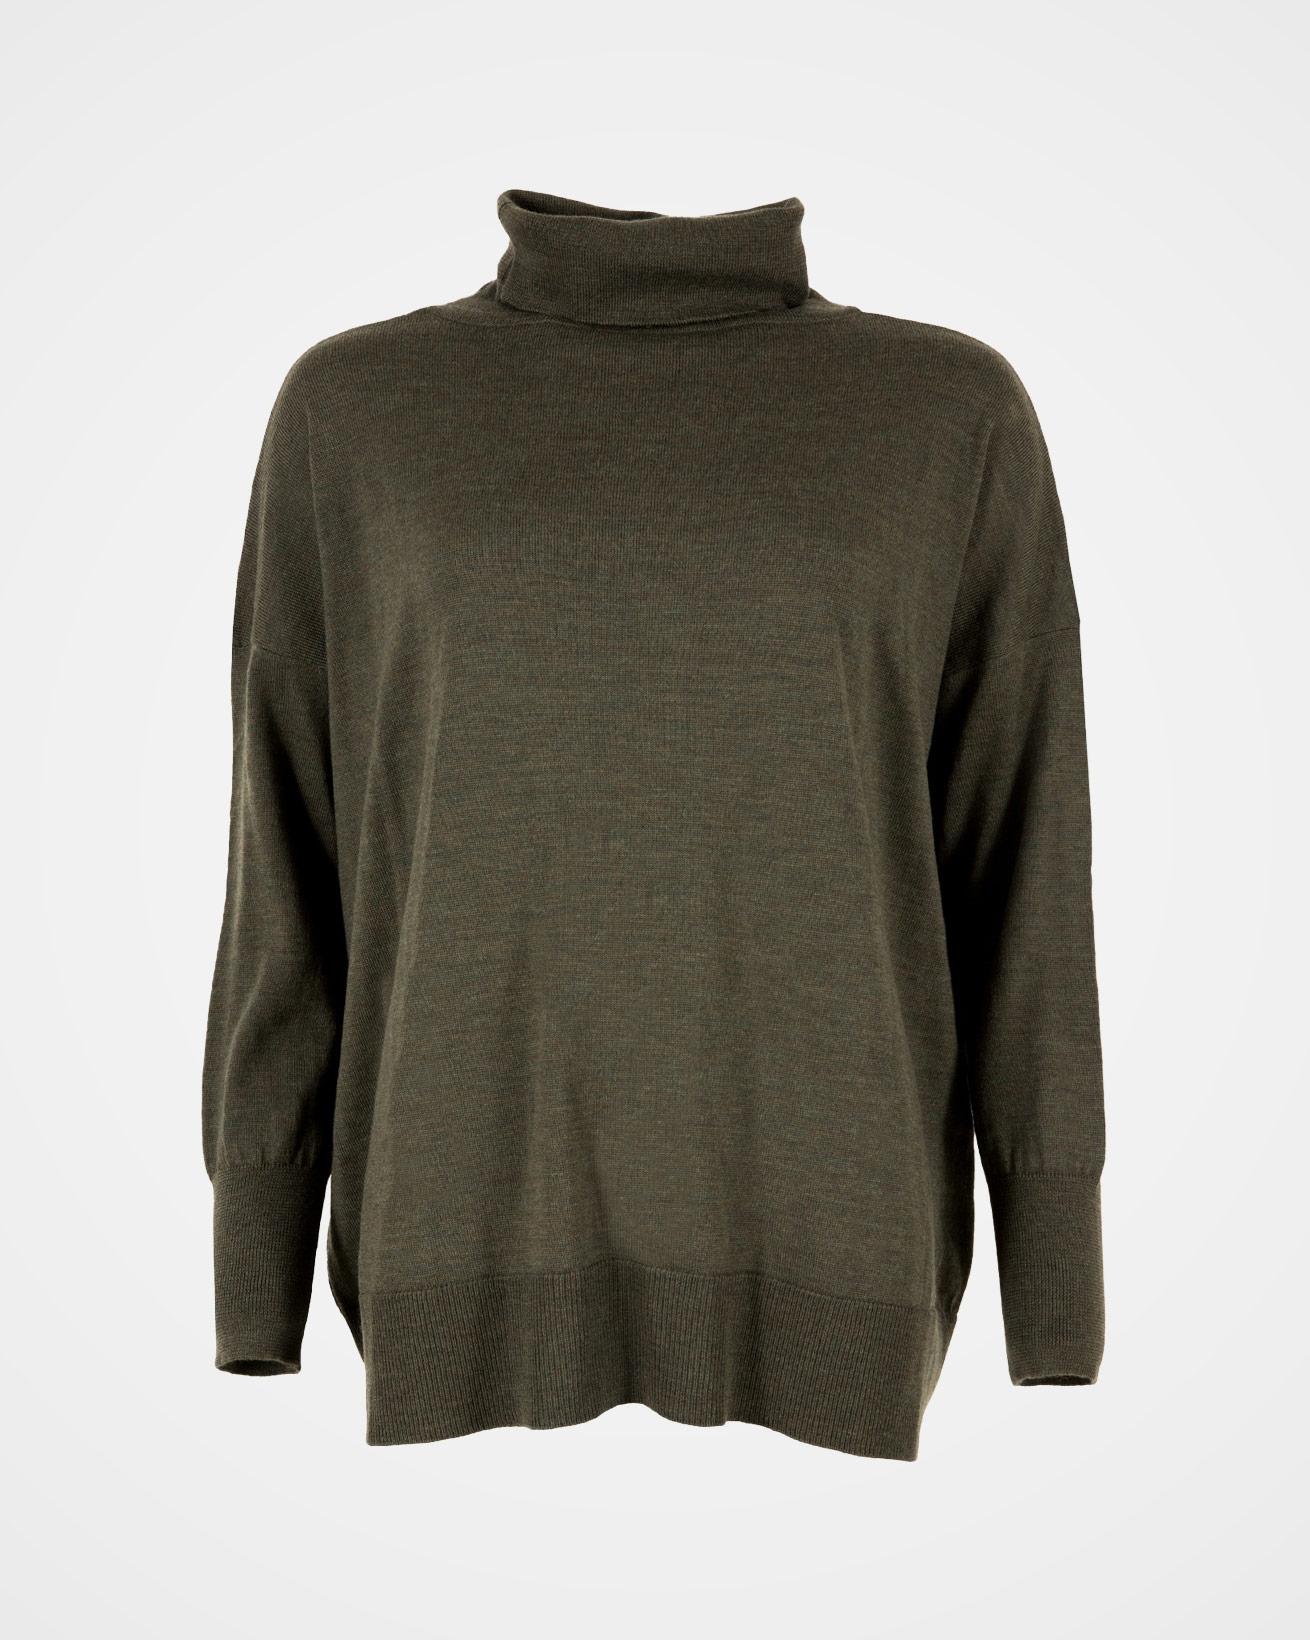 7401_slouchy-fine-knit-roll-neck_dark-moss_front.jpg